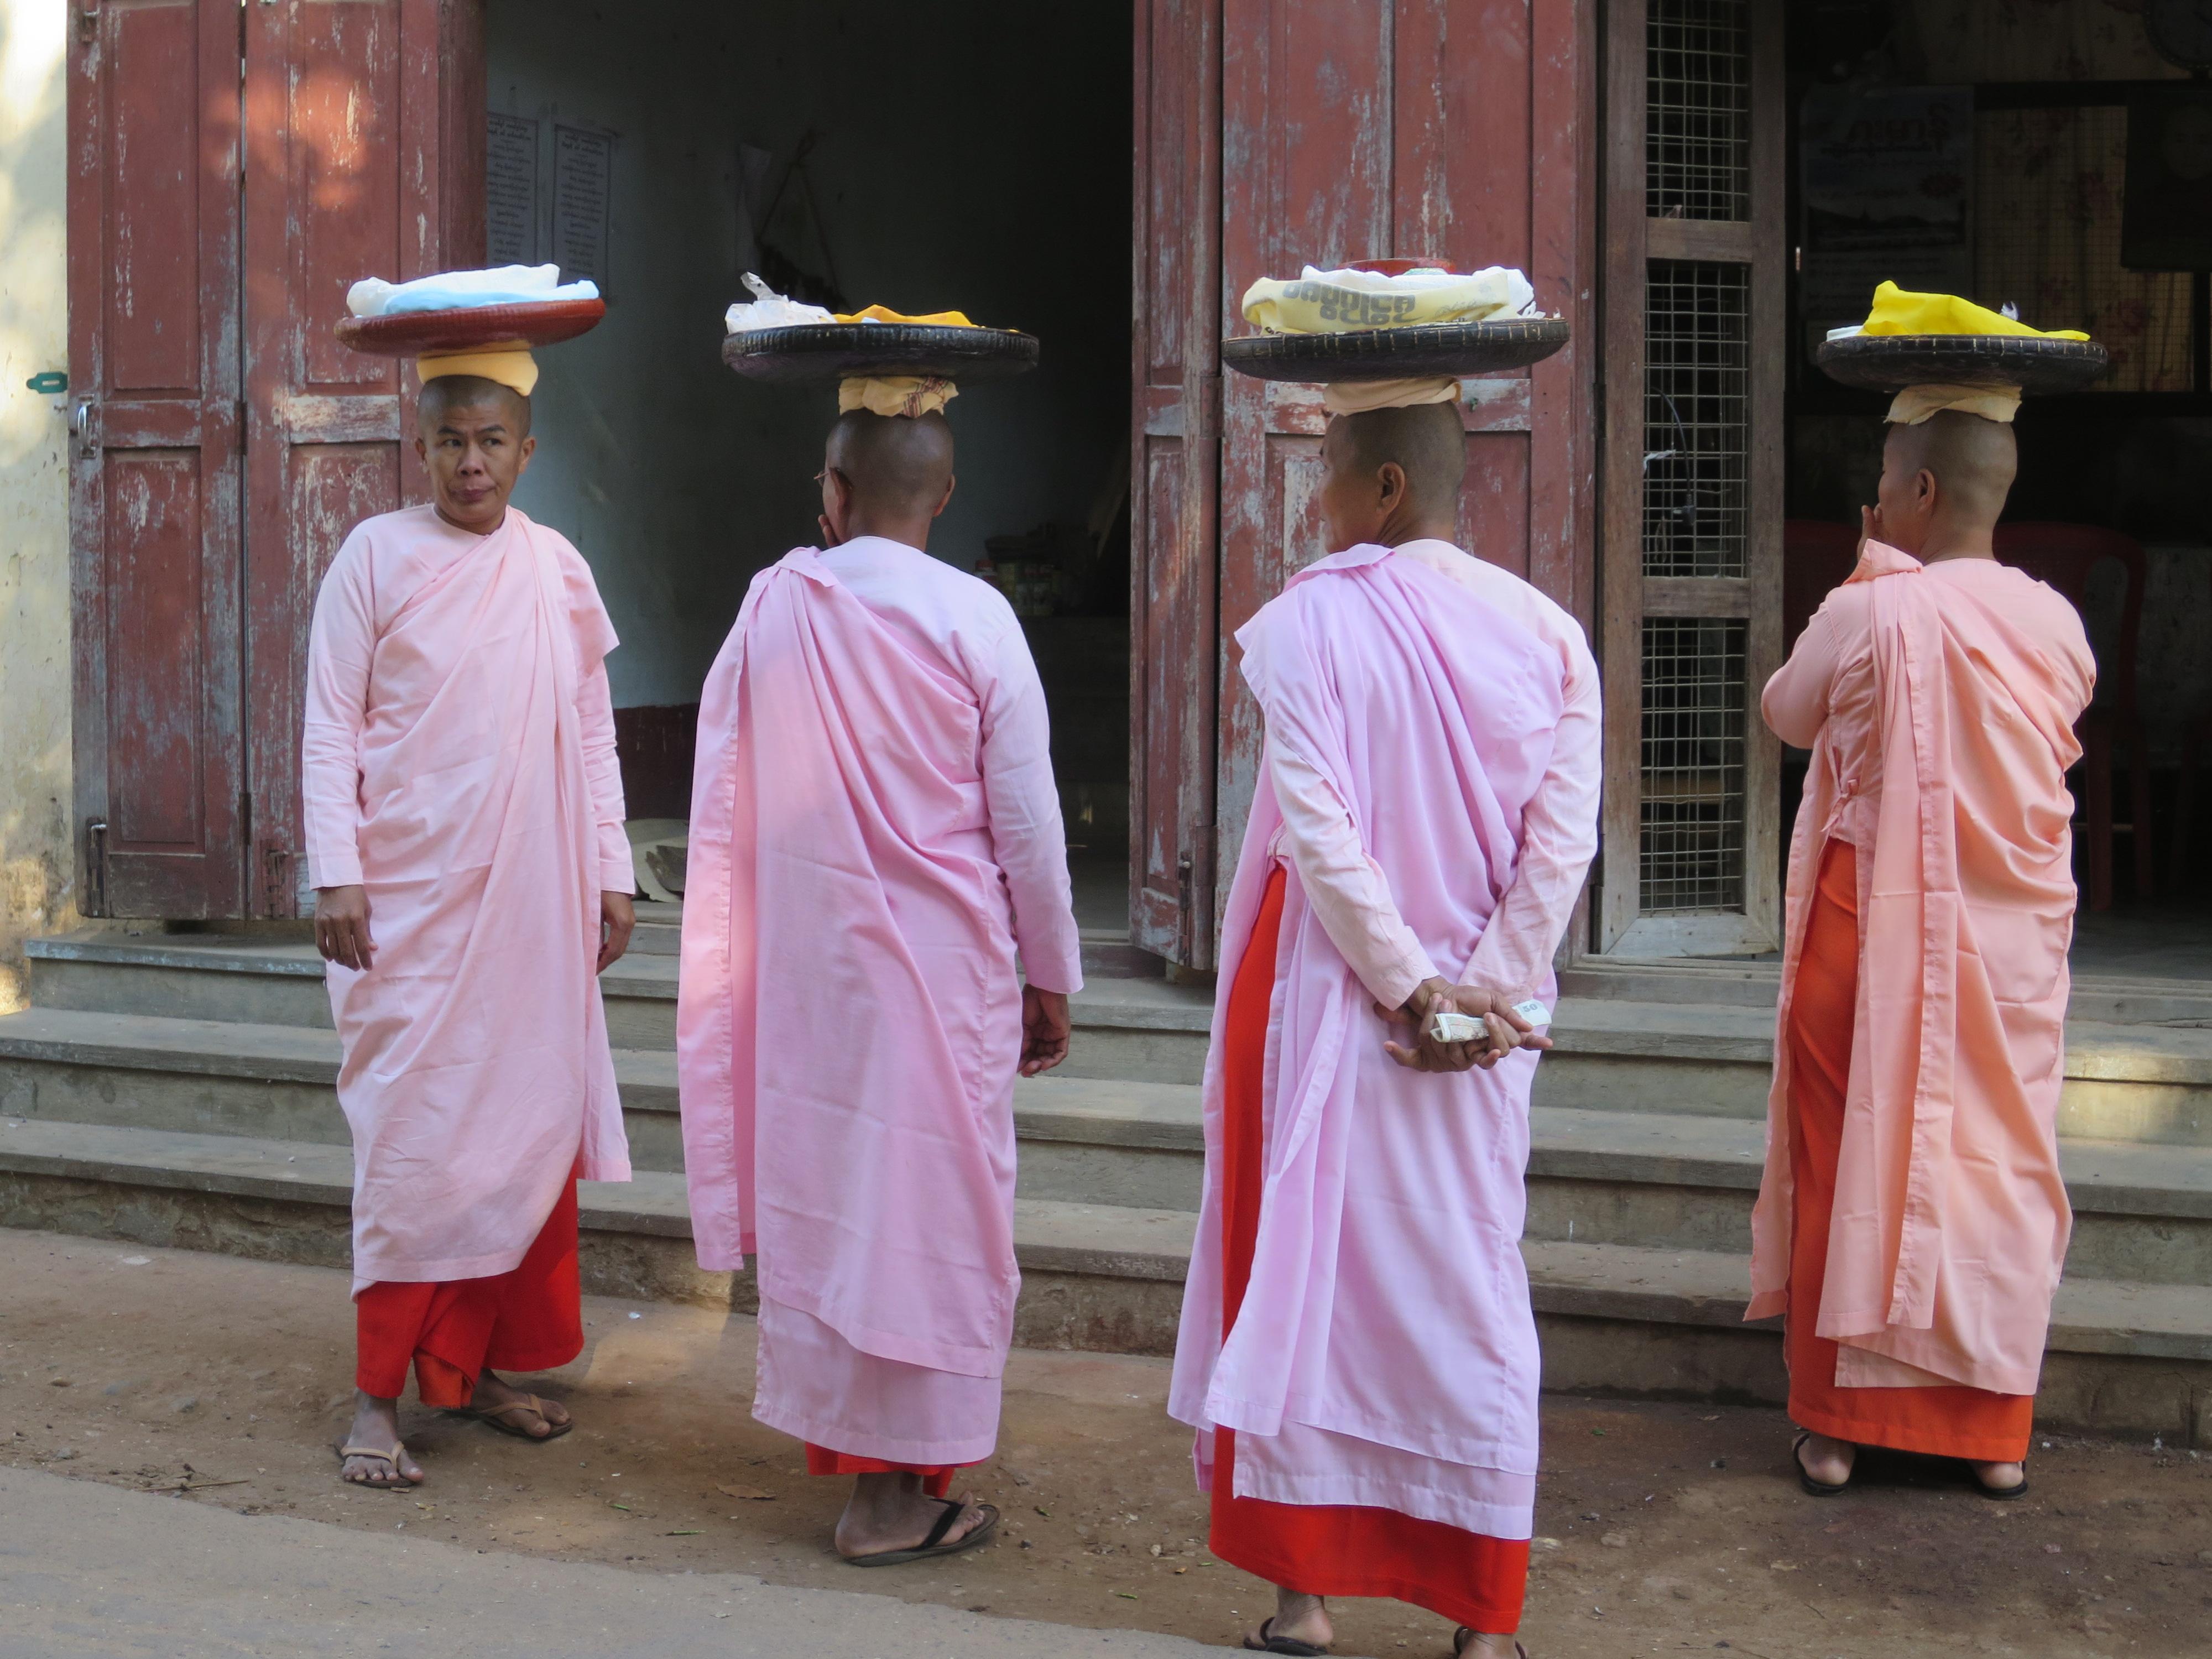 Female Monks in Myanmar